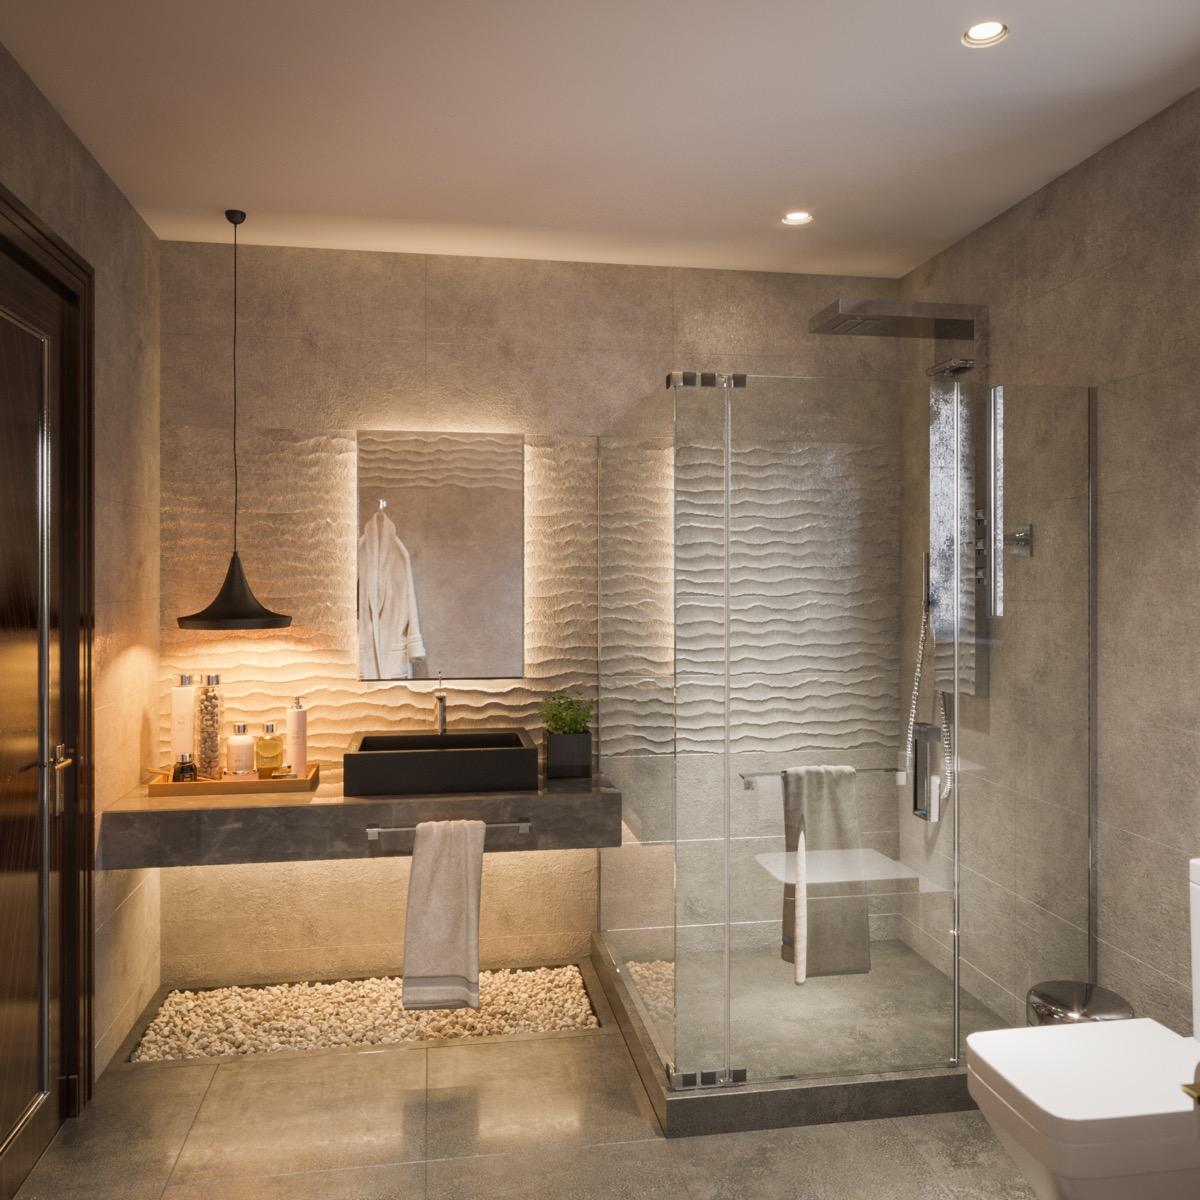 HOME DESIGNING: 51 Modern Bathroom Design Ideas Plus Tips ...